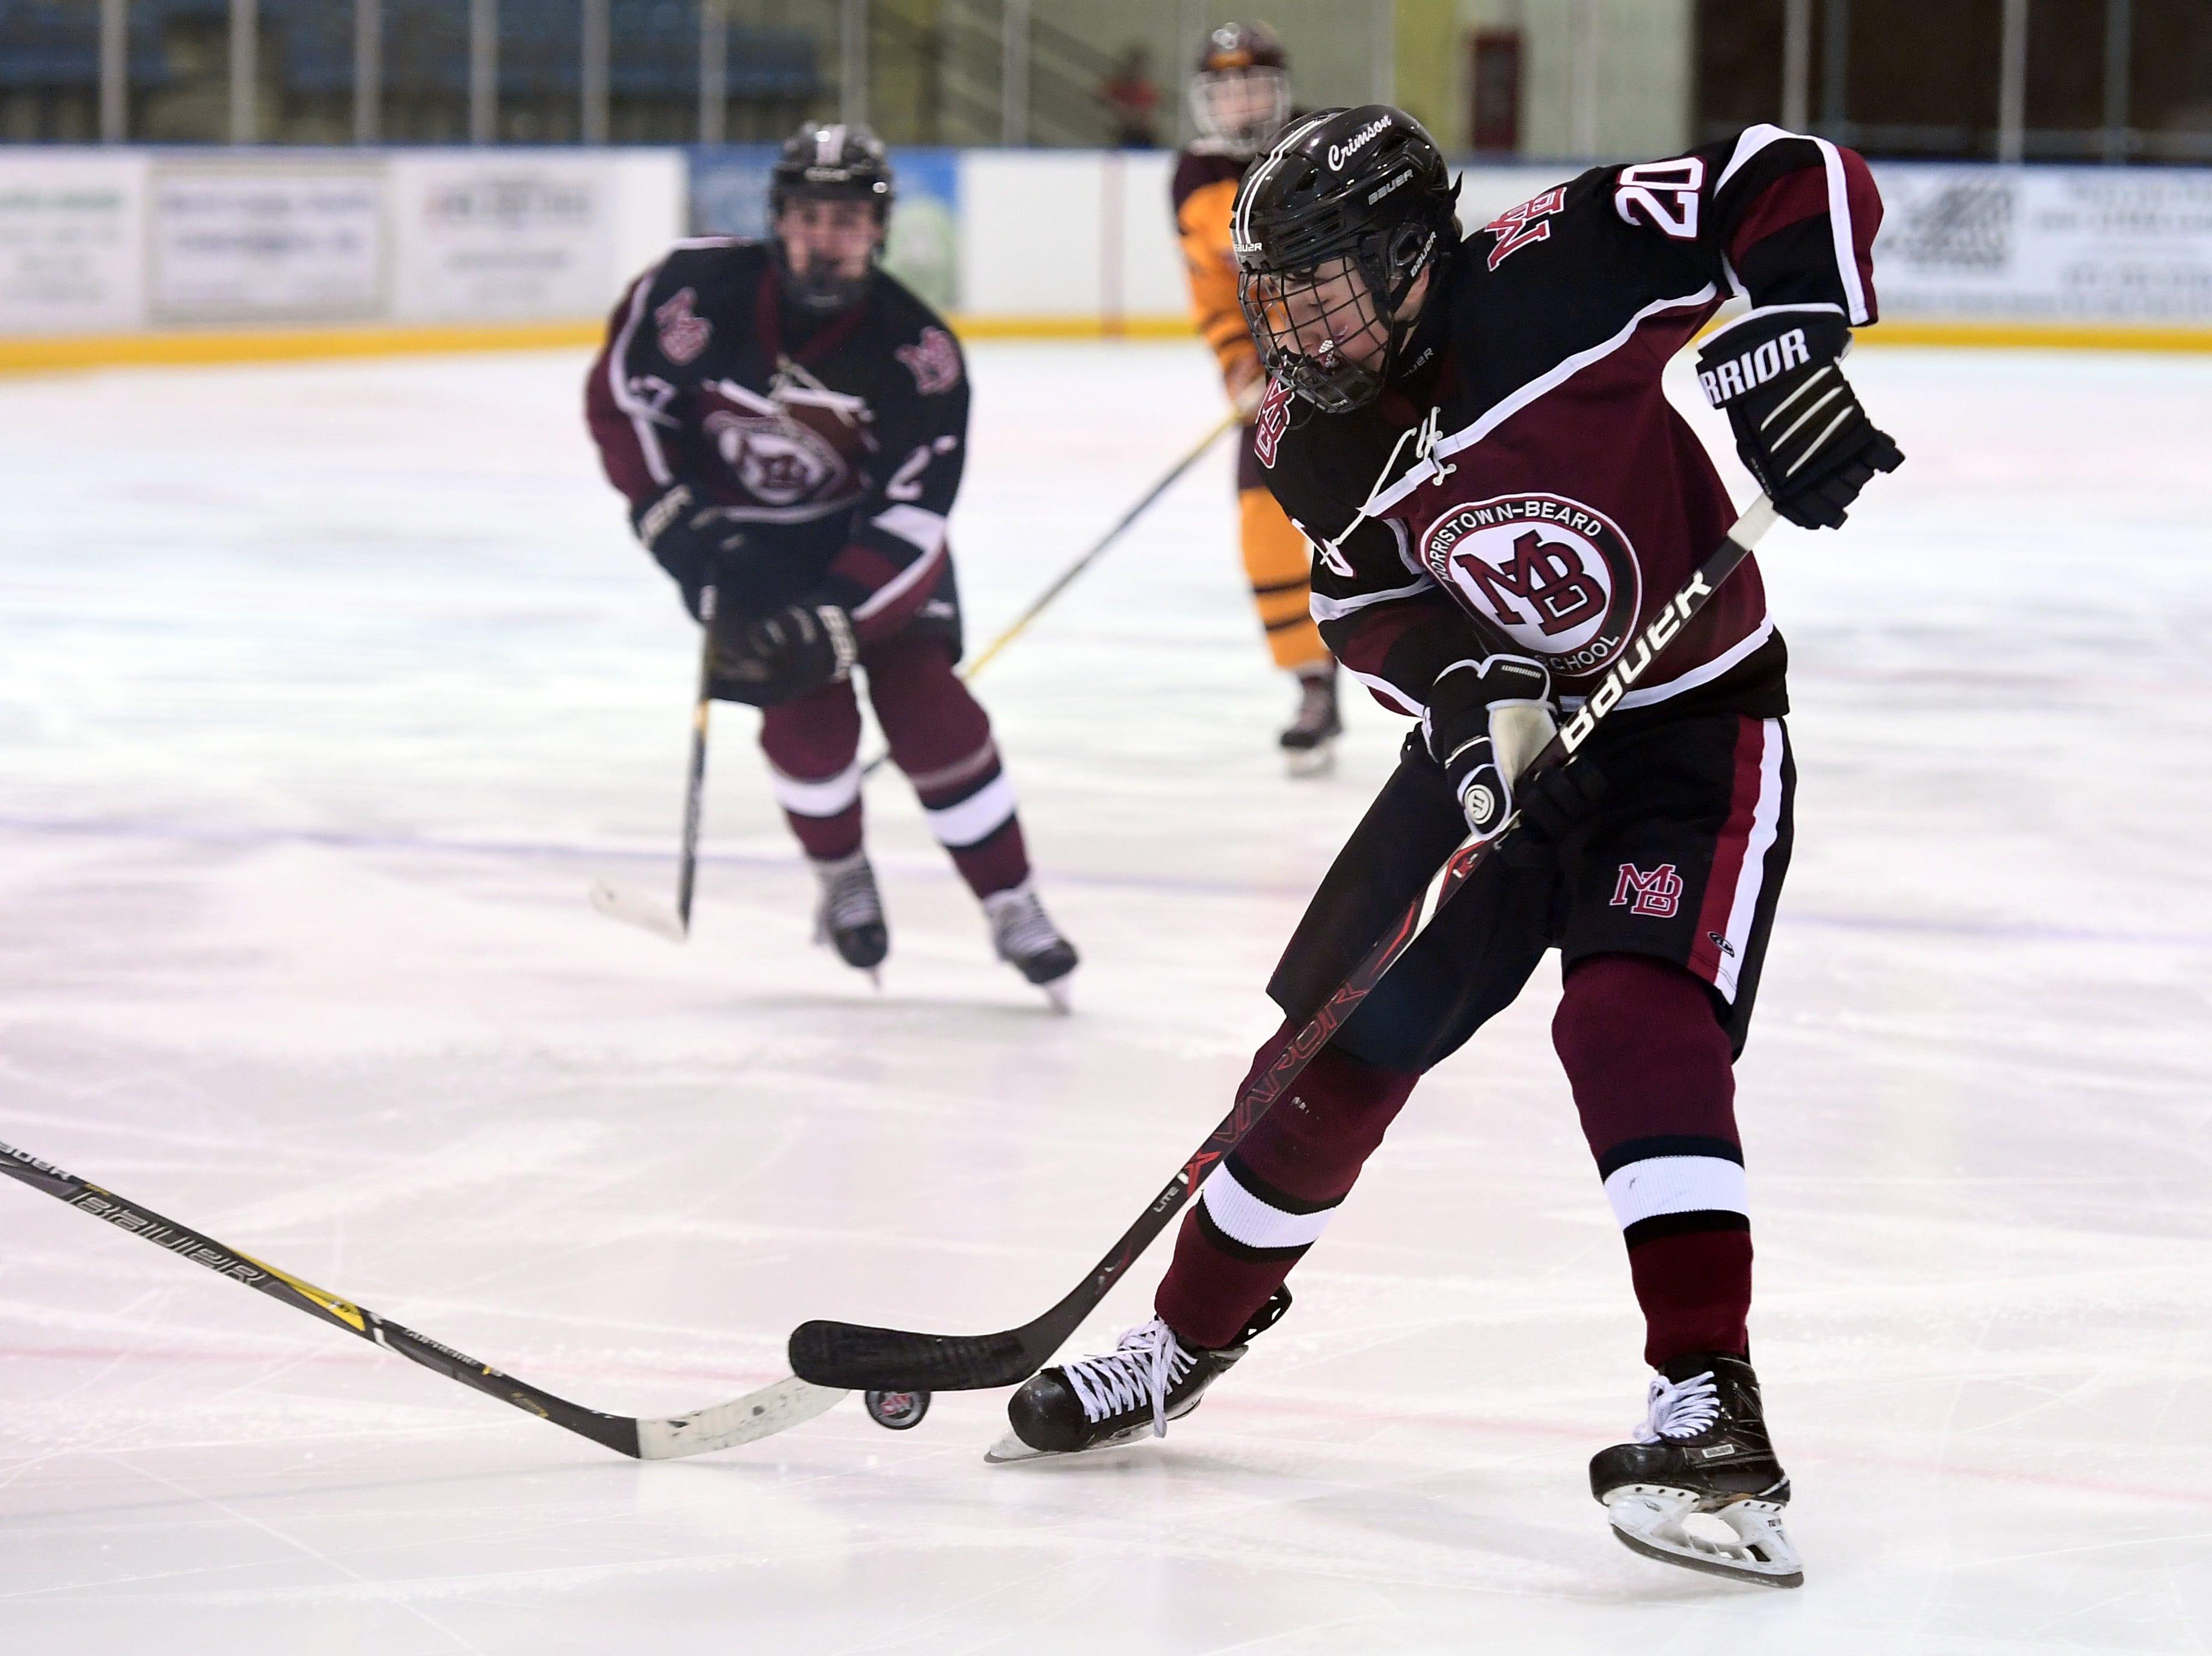 Madison ice hockey vs. Morristown-Beard at Mennen Sports Arena on Thursday, December 20, 2018. Morristown-Beard #20 Nick Vantassell.